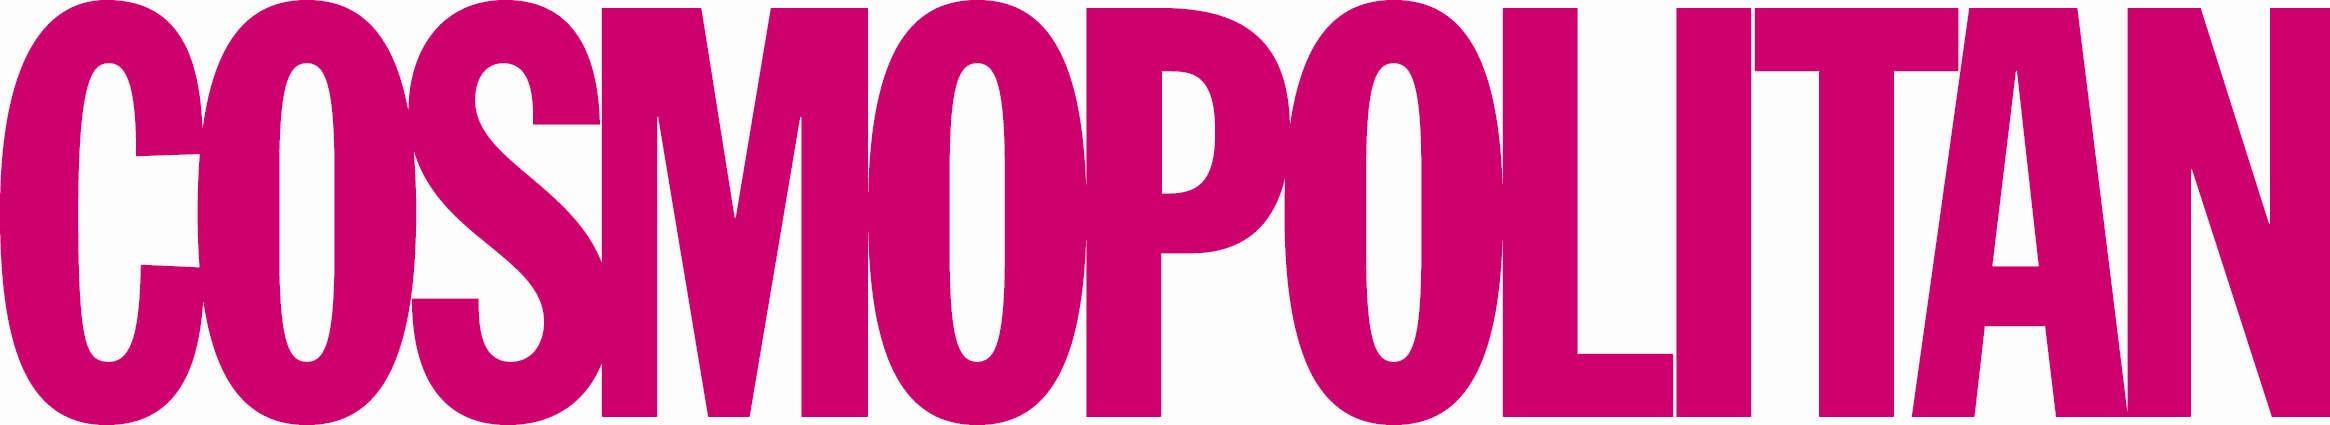 Cosmopolitan_logo.jpg